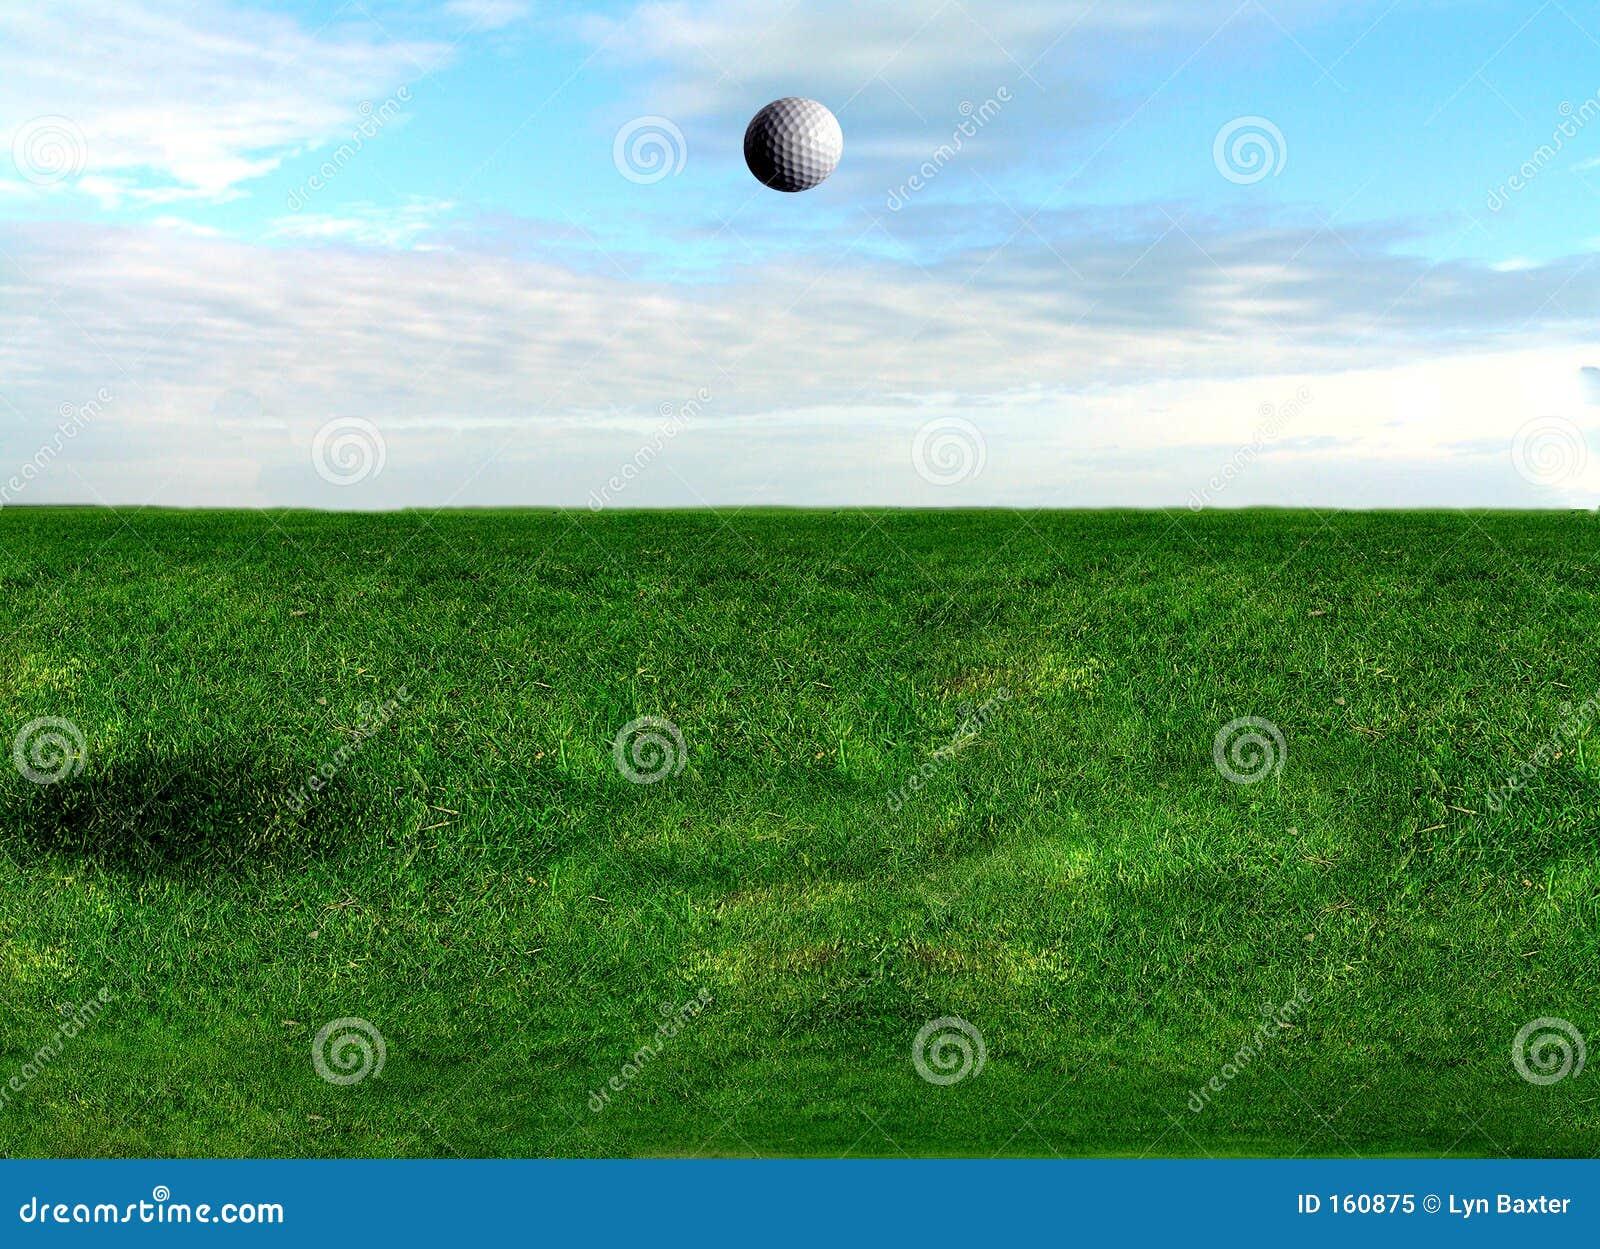 Golf Ball Flying